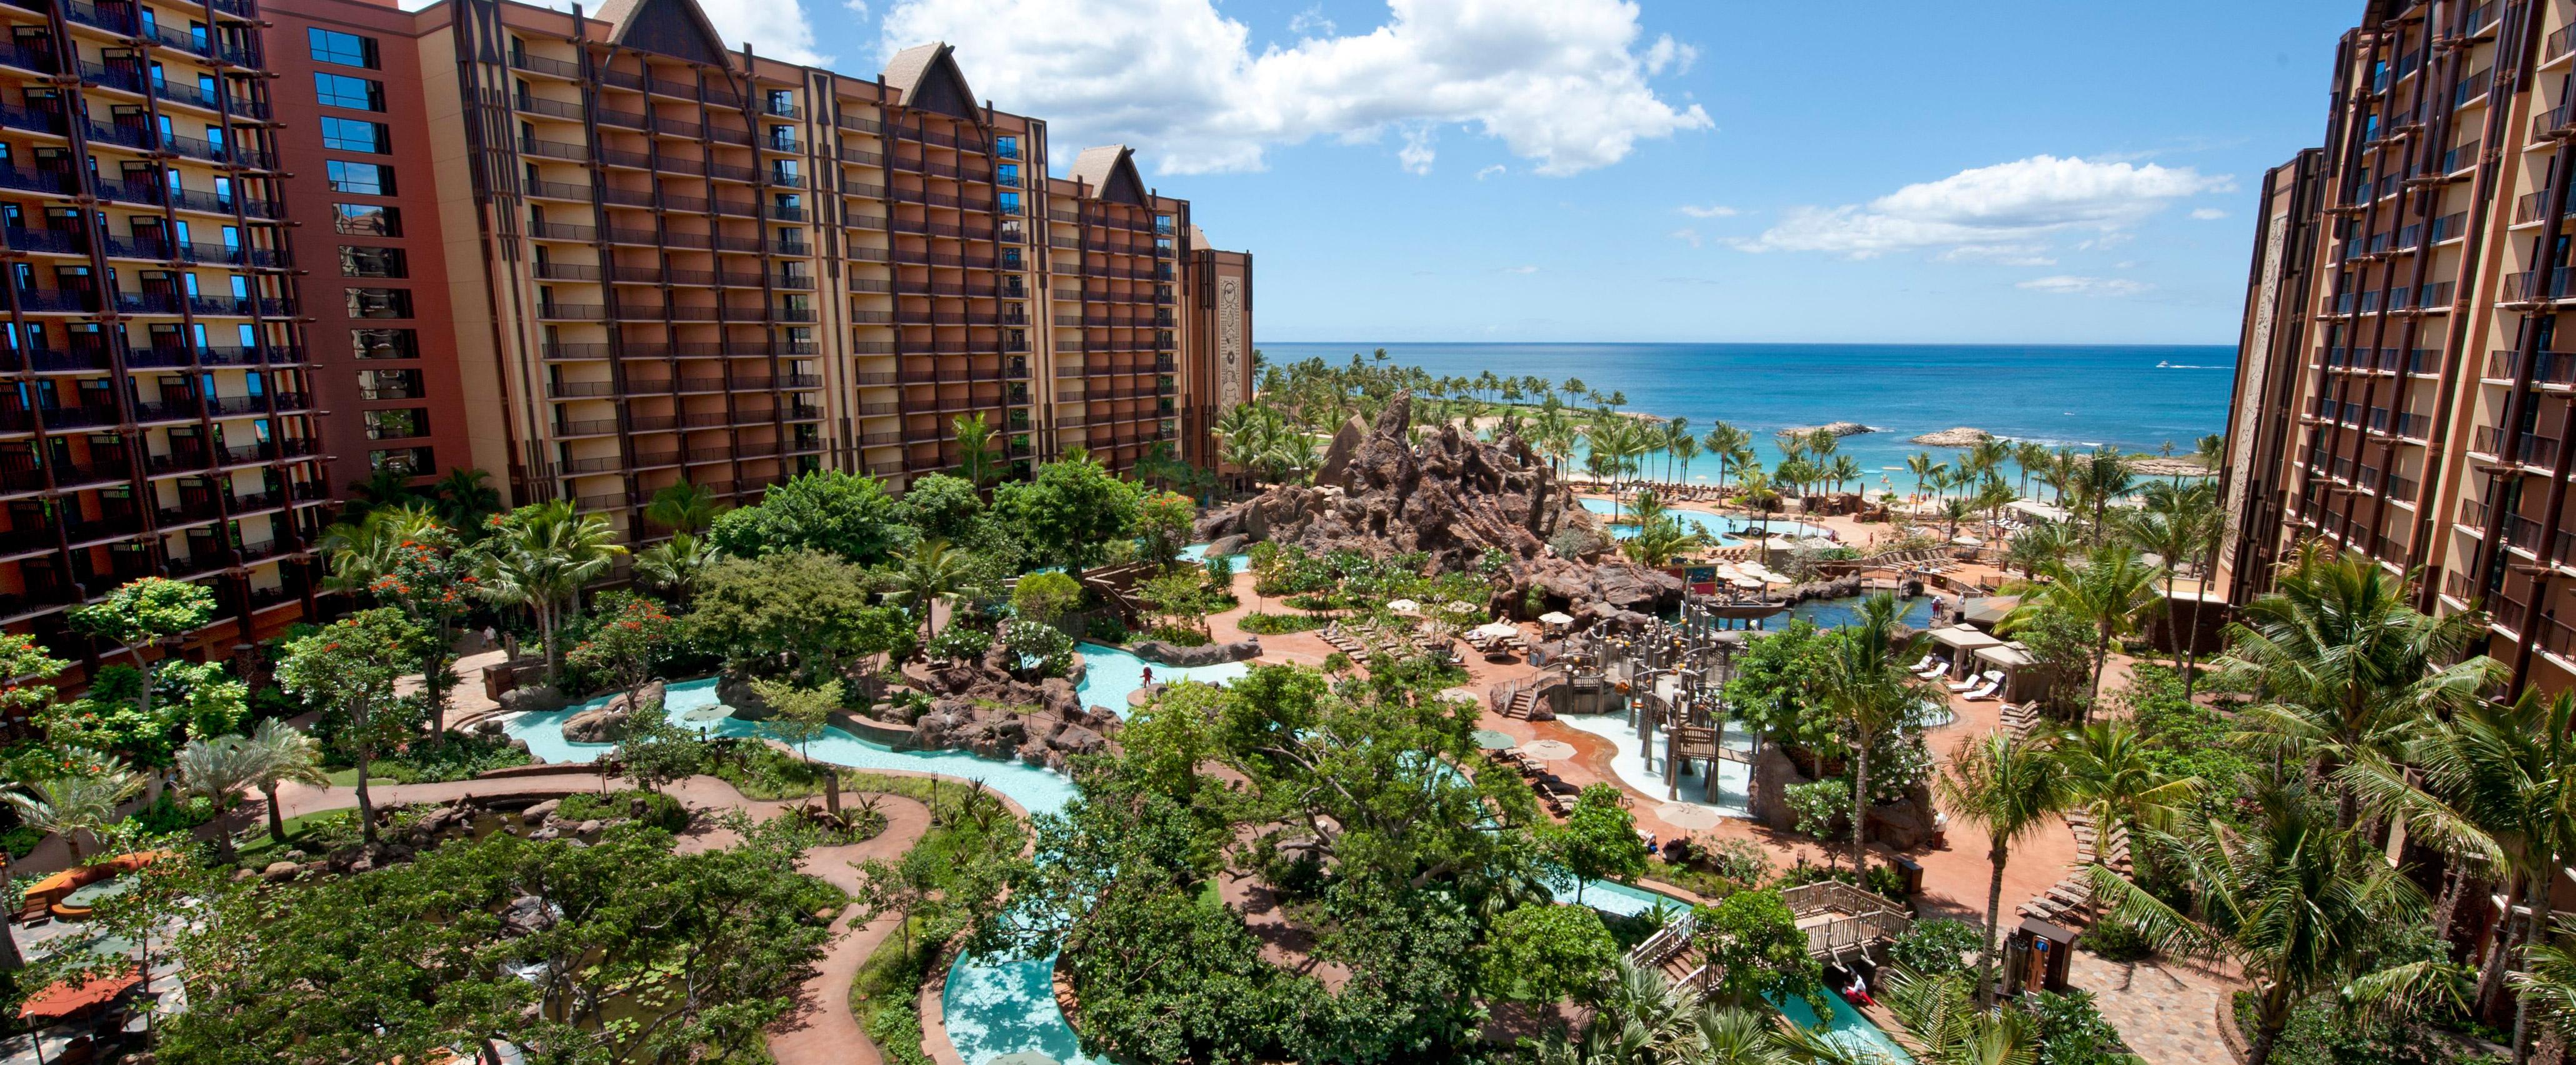 The Aulani Resort Story Aulani Hawaii Resort Amp Spa